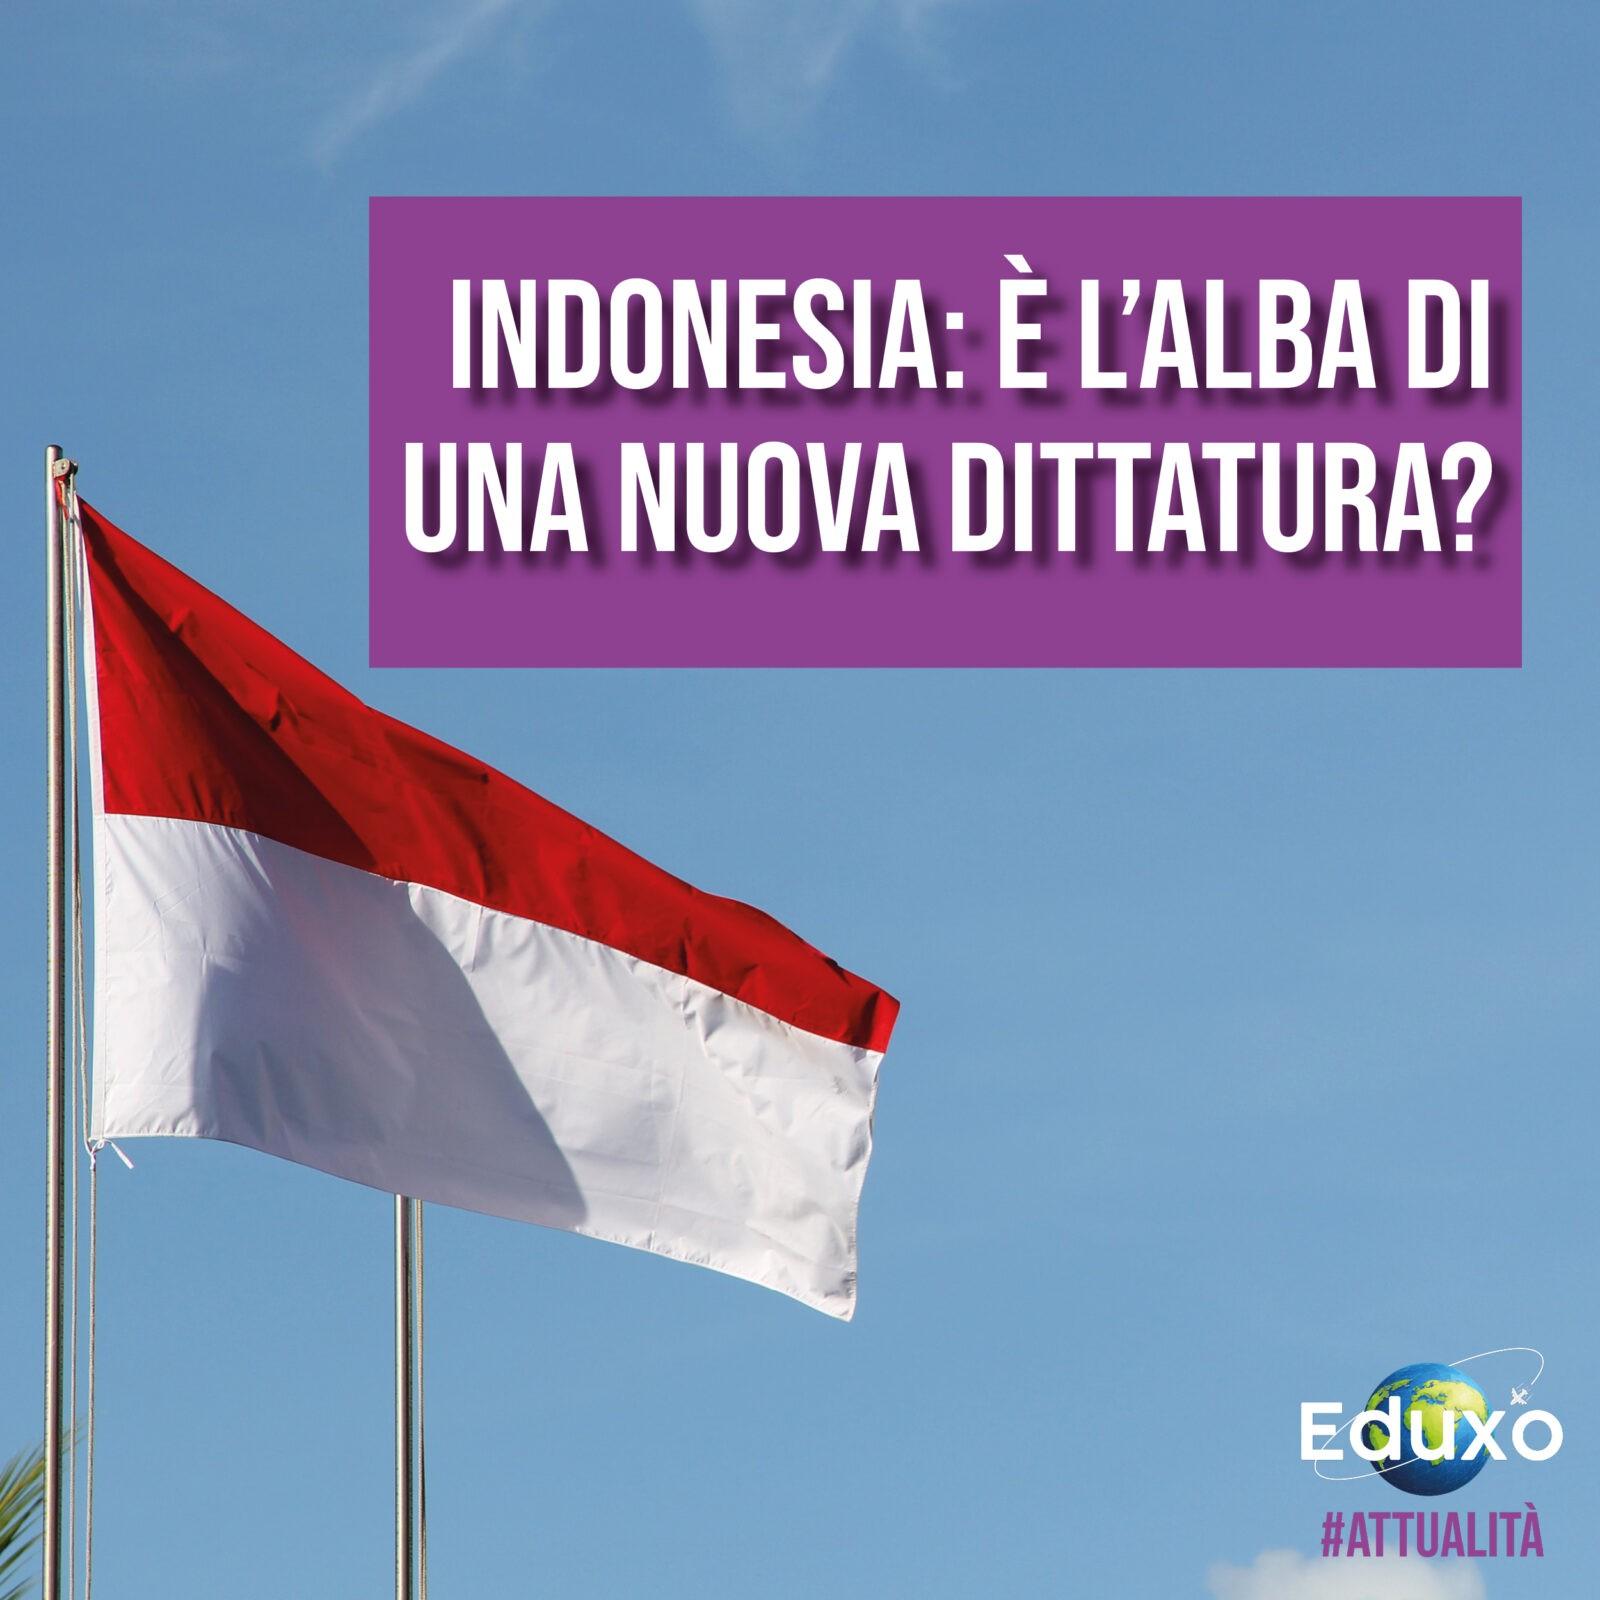 You are currently viewing Indonesia: è l'alba di una nuova dittatura?